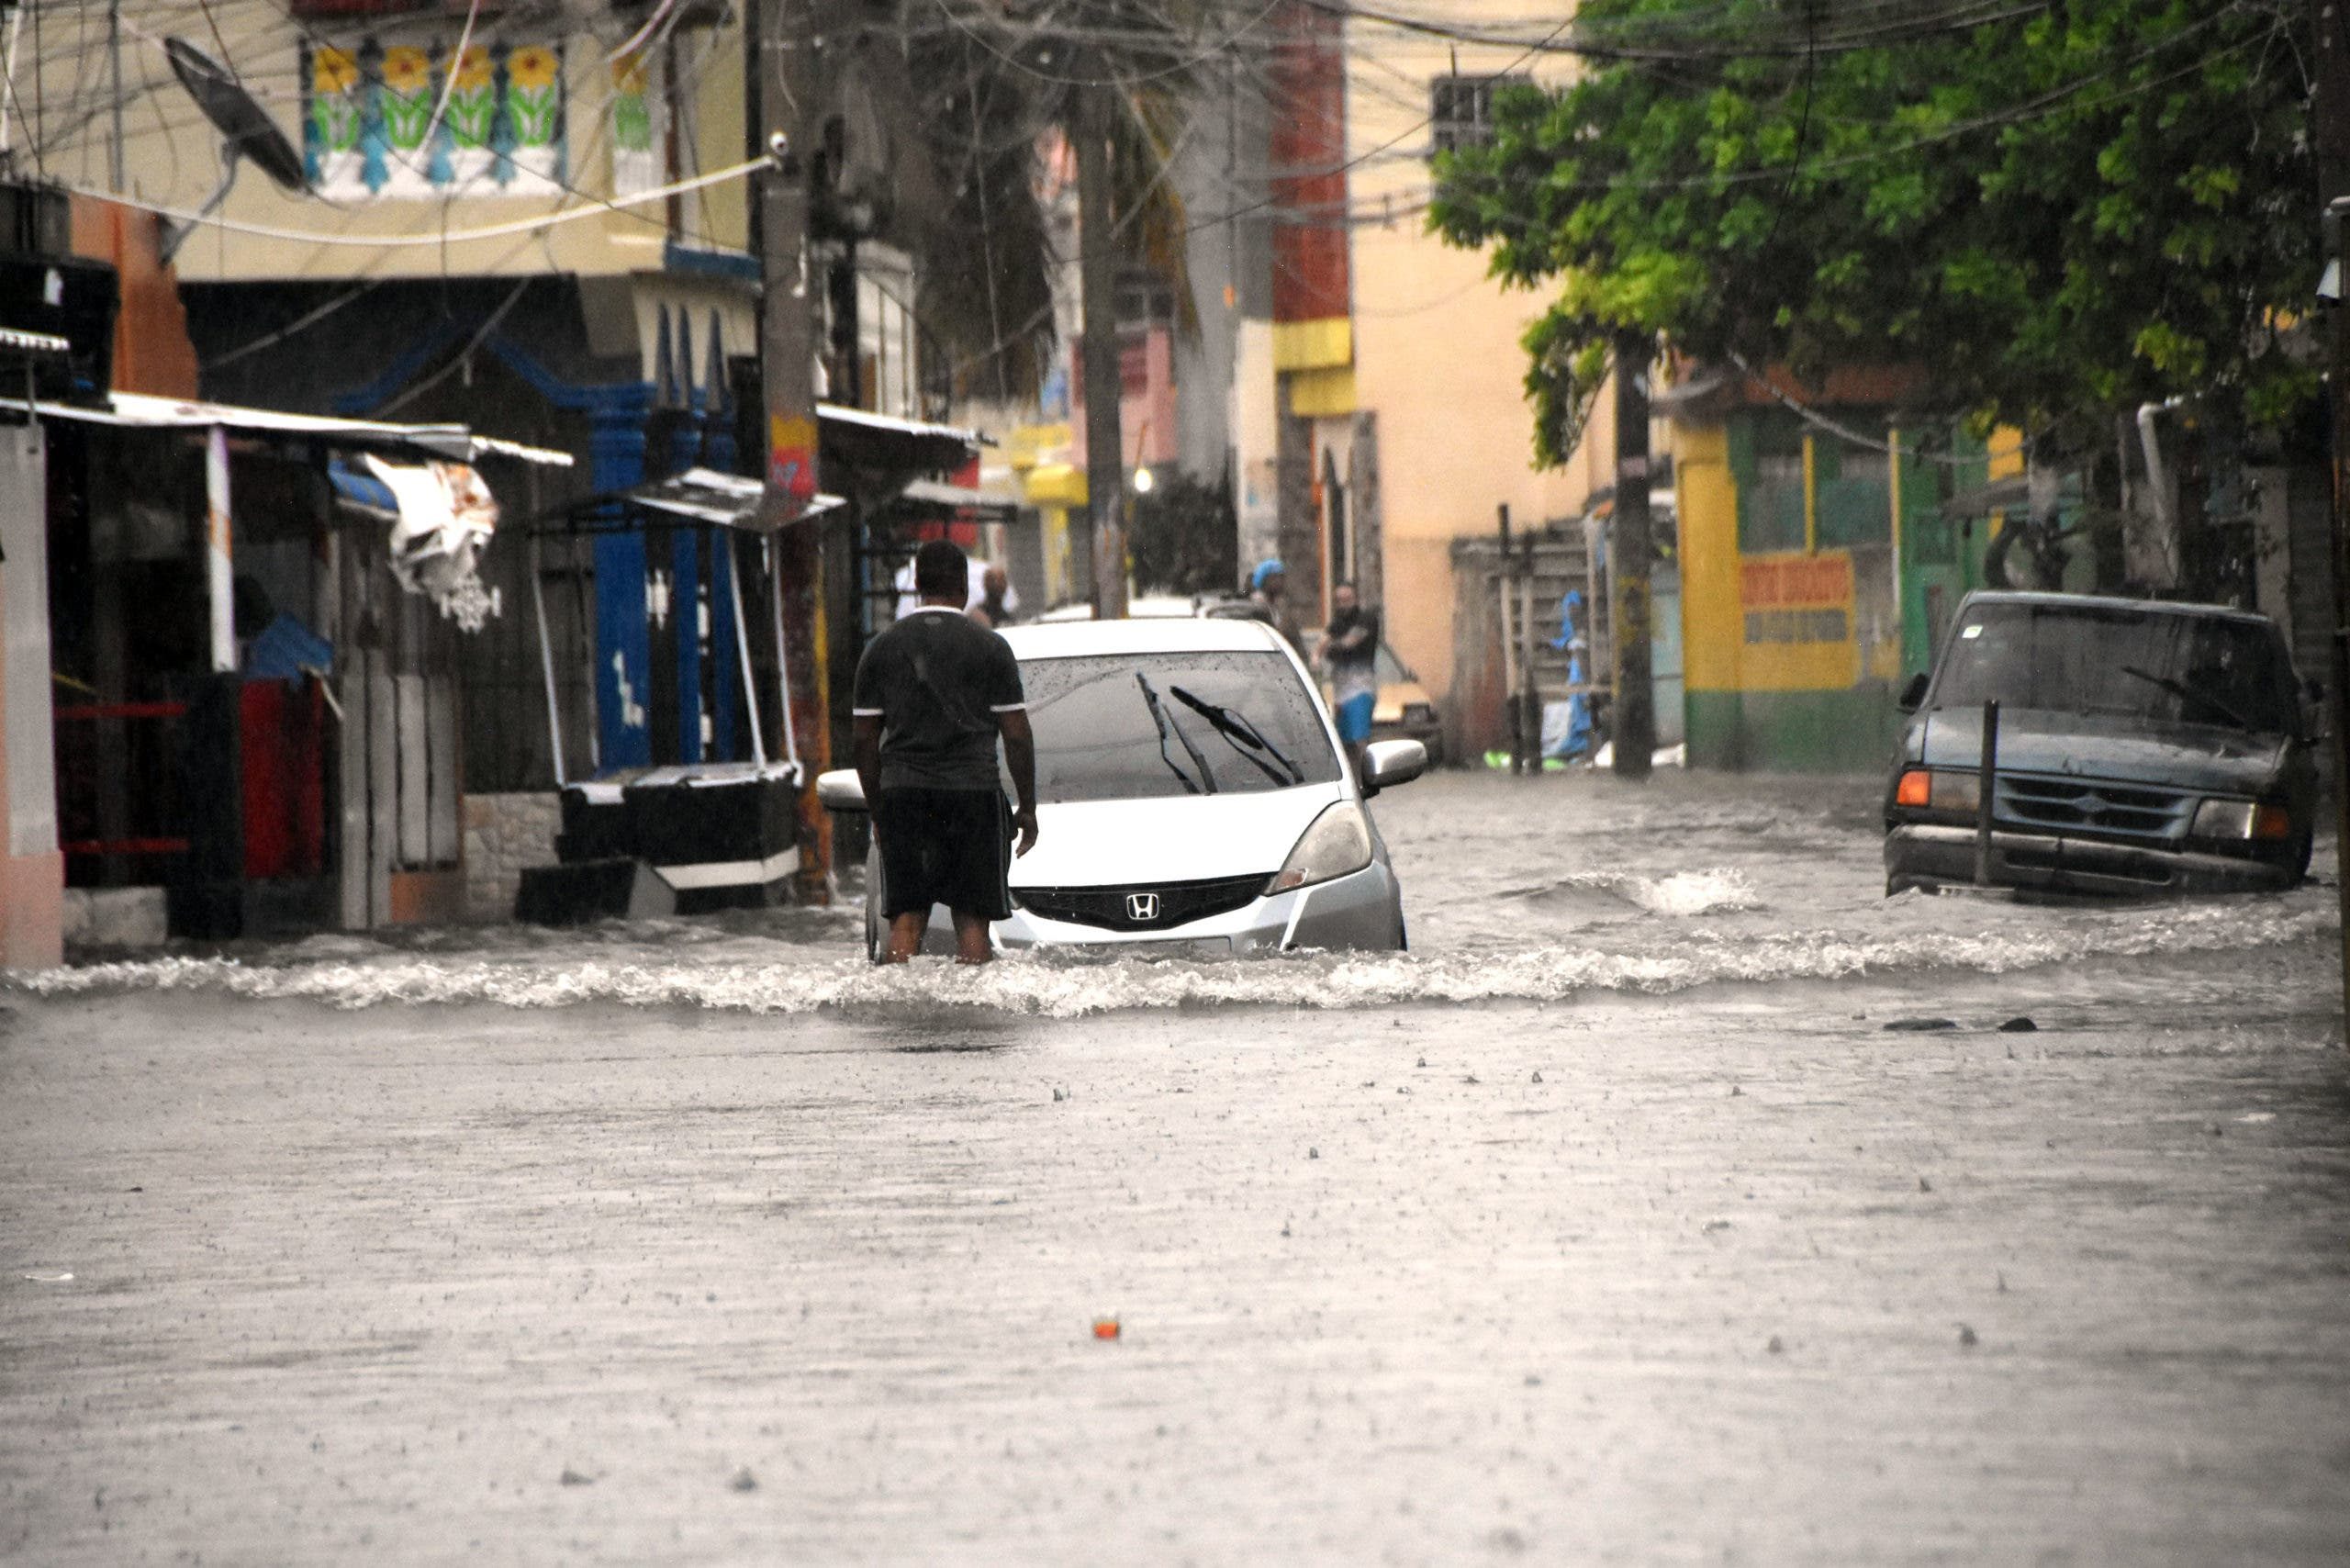 COE reporta 395 viviendas afectadas, 133 personas albergadas y 41 comunidades incomunicadas